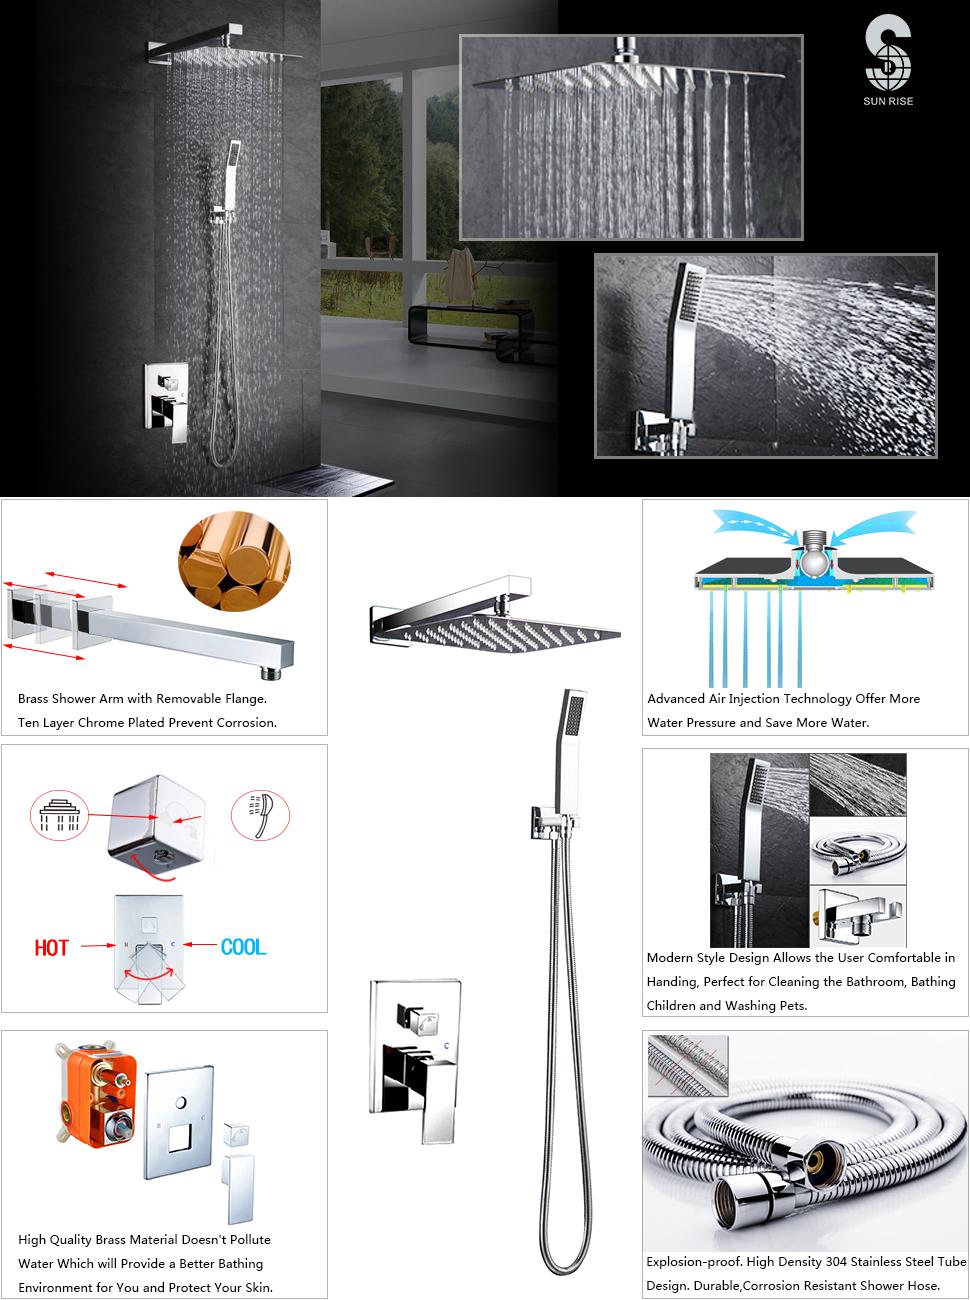 Sr Sun Rise Srsh F5043 Bathroom Luxury Rain Mixer Shower